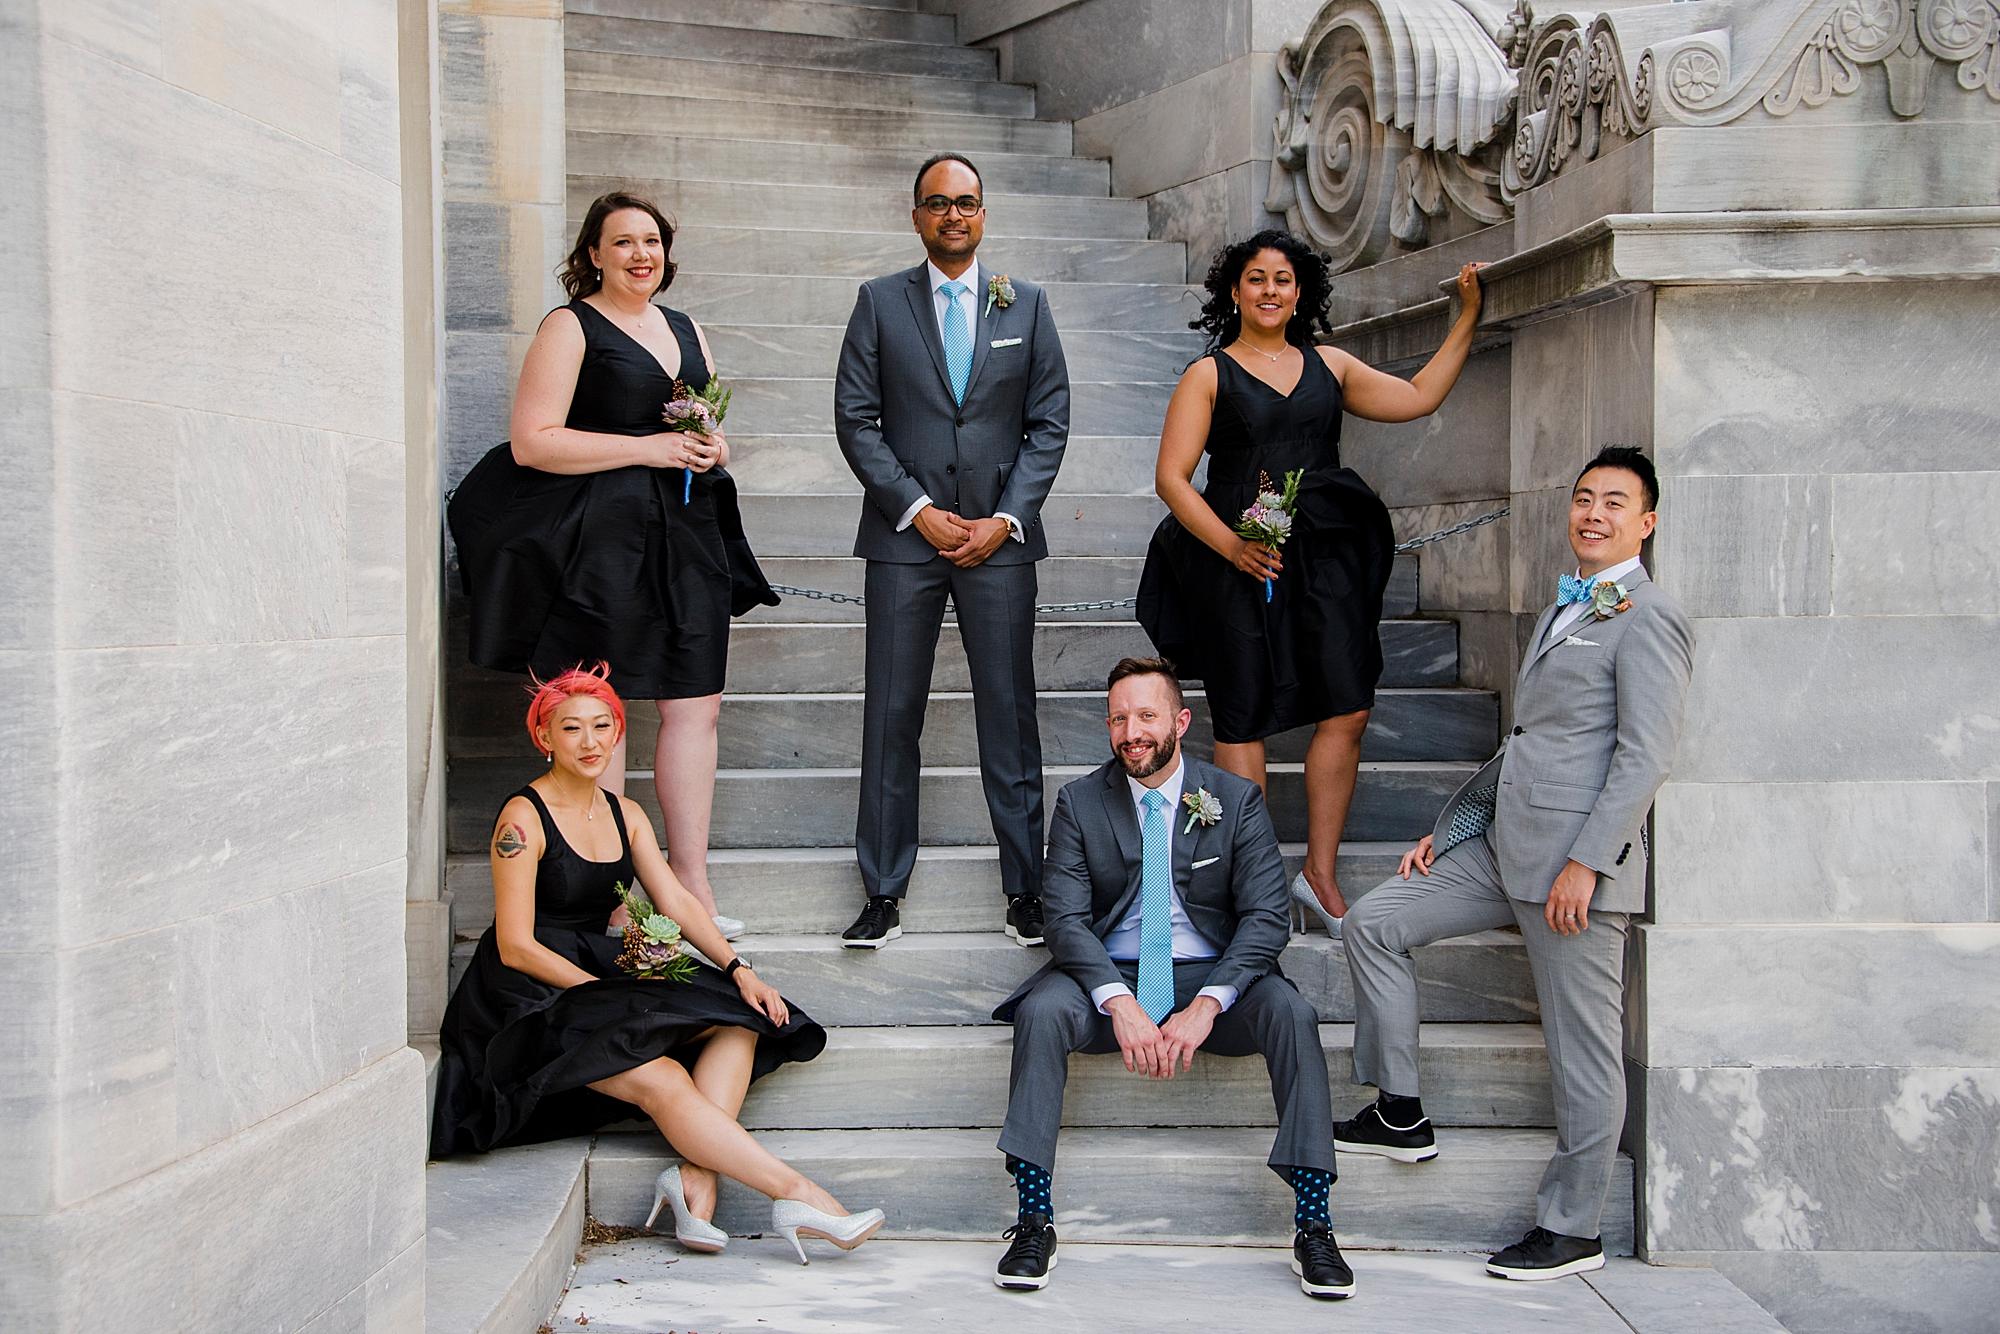 Dan_and_Byron_Love_by_Joe_Mac_Philadelphia_Wedding_LGBTQ_Photography_Gay_Independence_visitor_Center_65.JPG